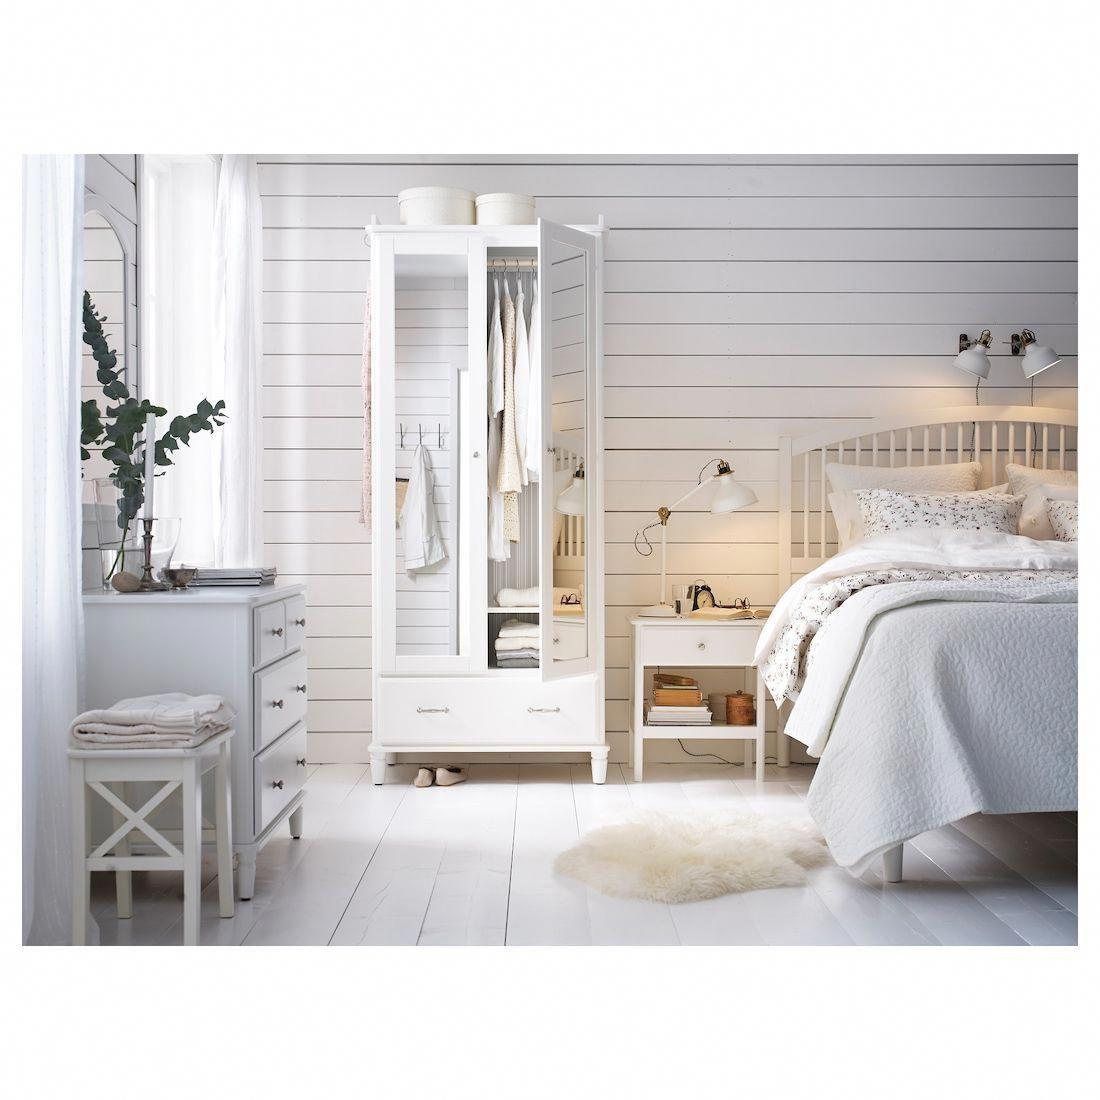 TYSSEDAL Bed frame white, Luröy Queen White bed frame